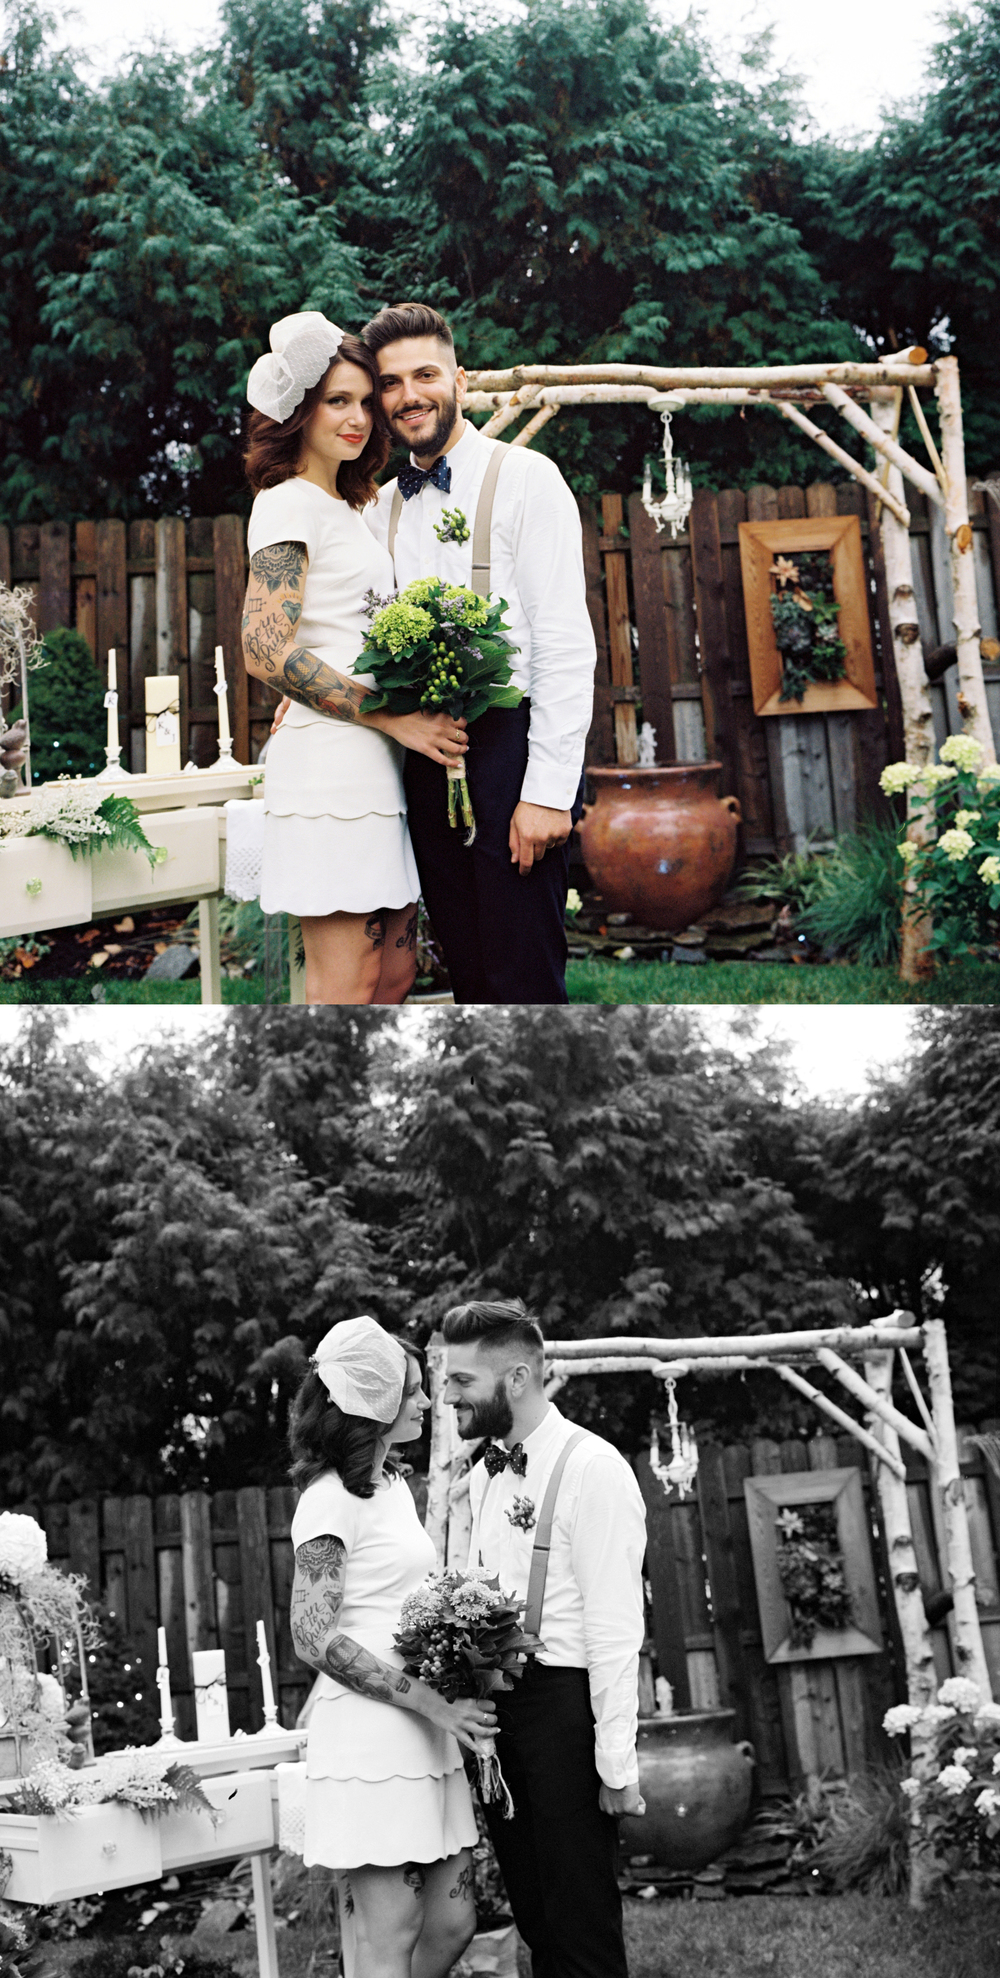 K+J Rustic Wedding 2014